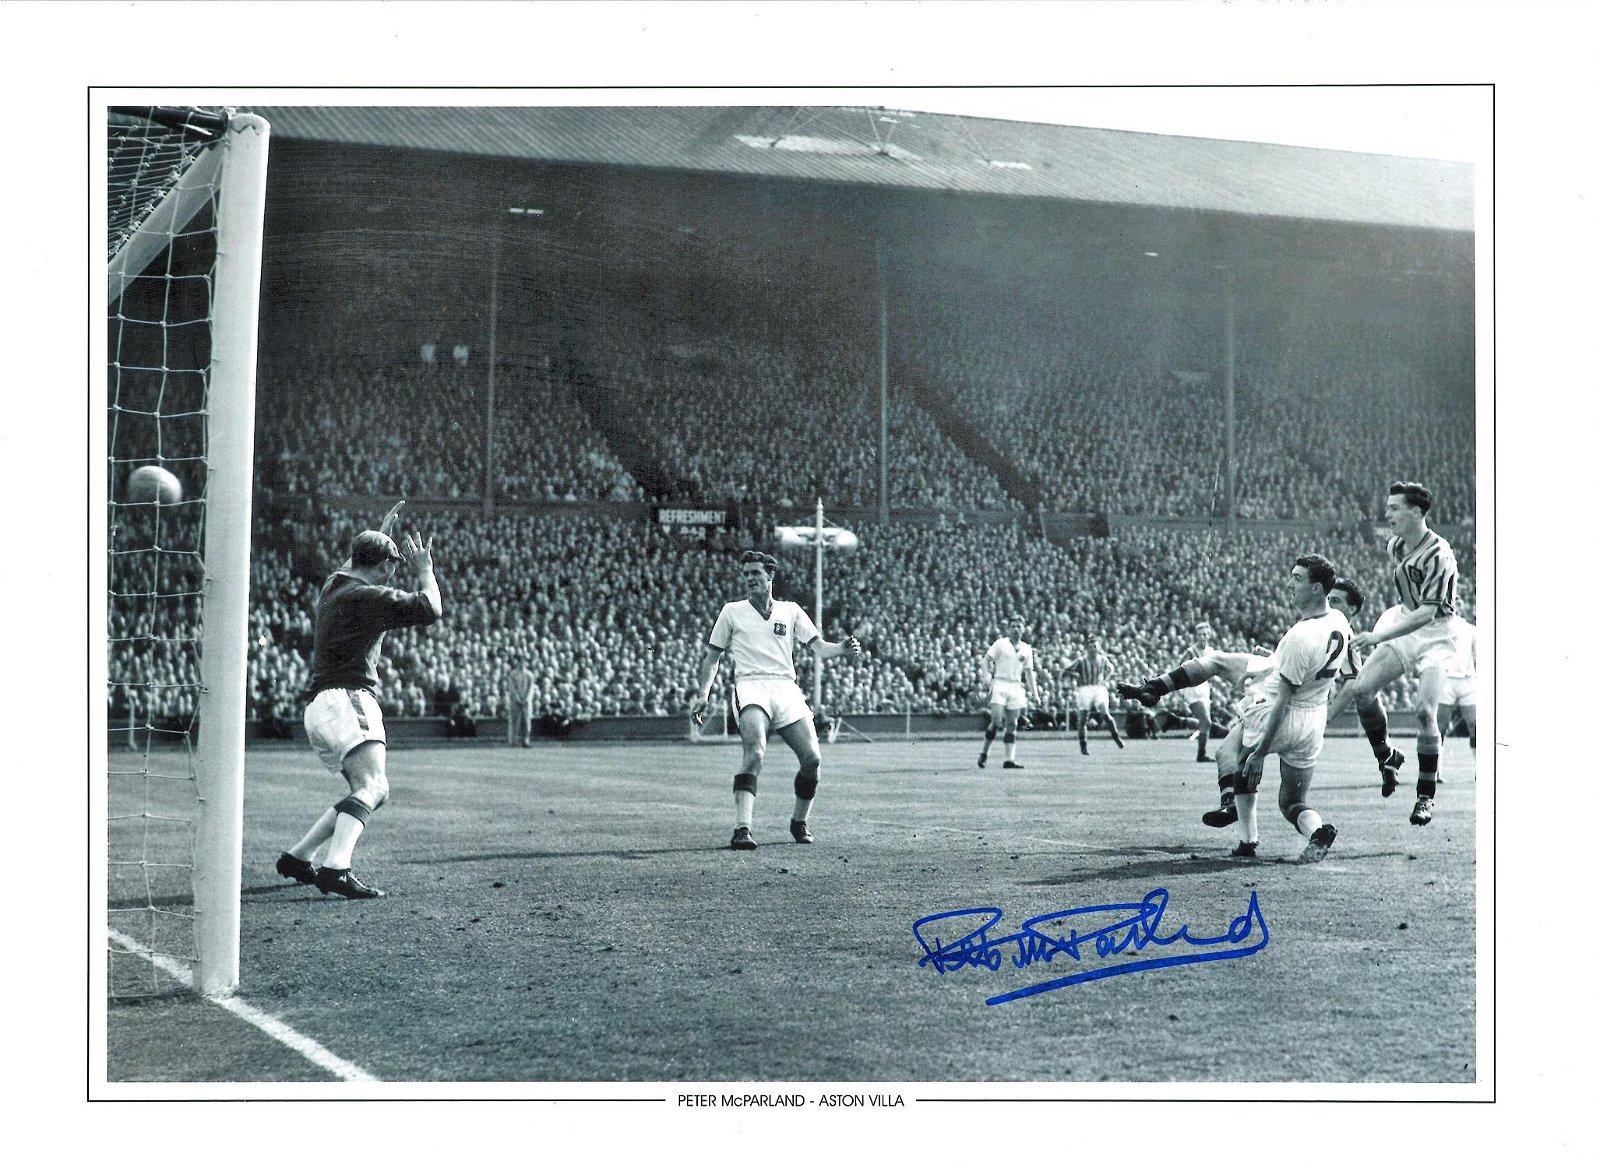 Peter Mcparland Signed Aston Villa 12x16 Photo . Good